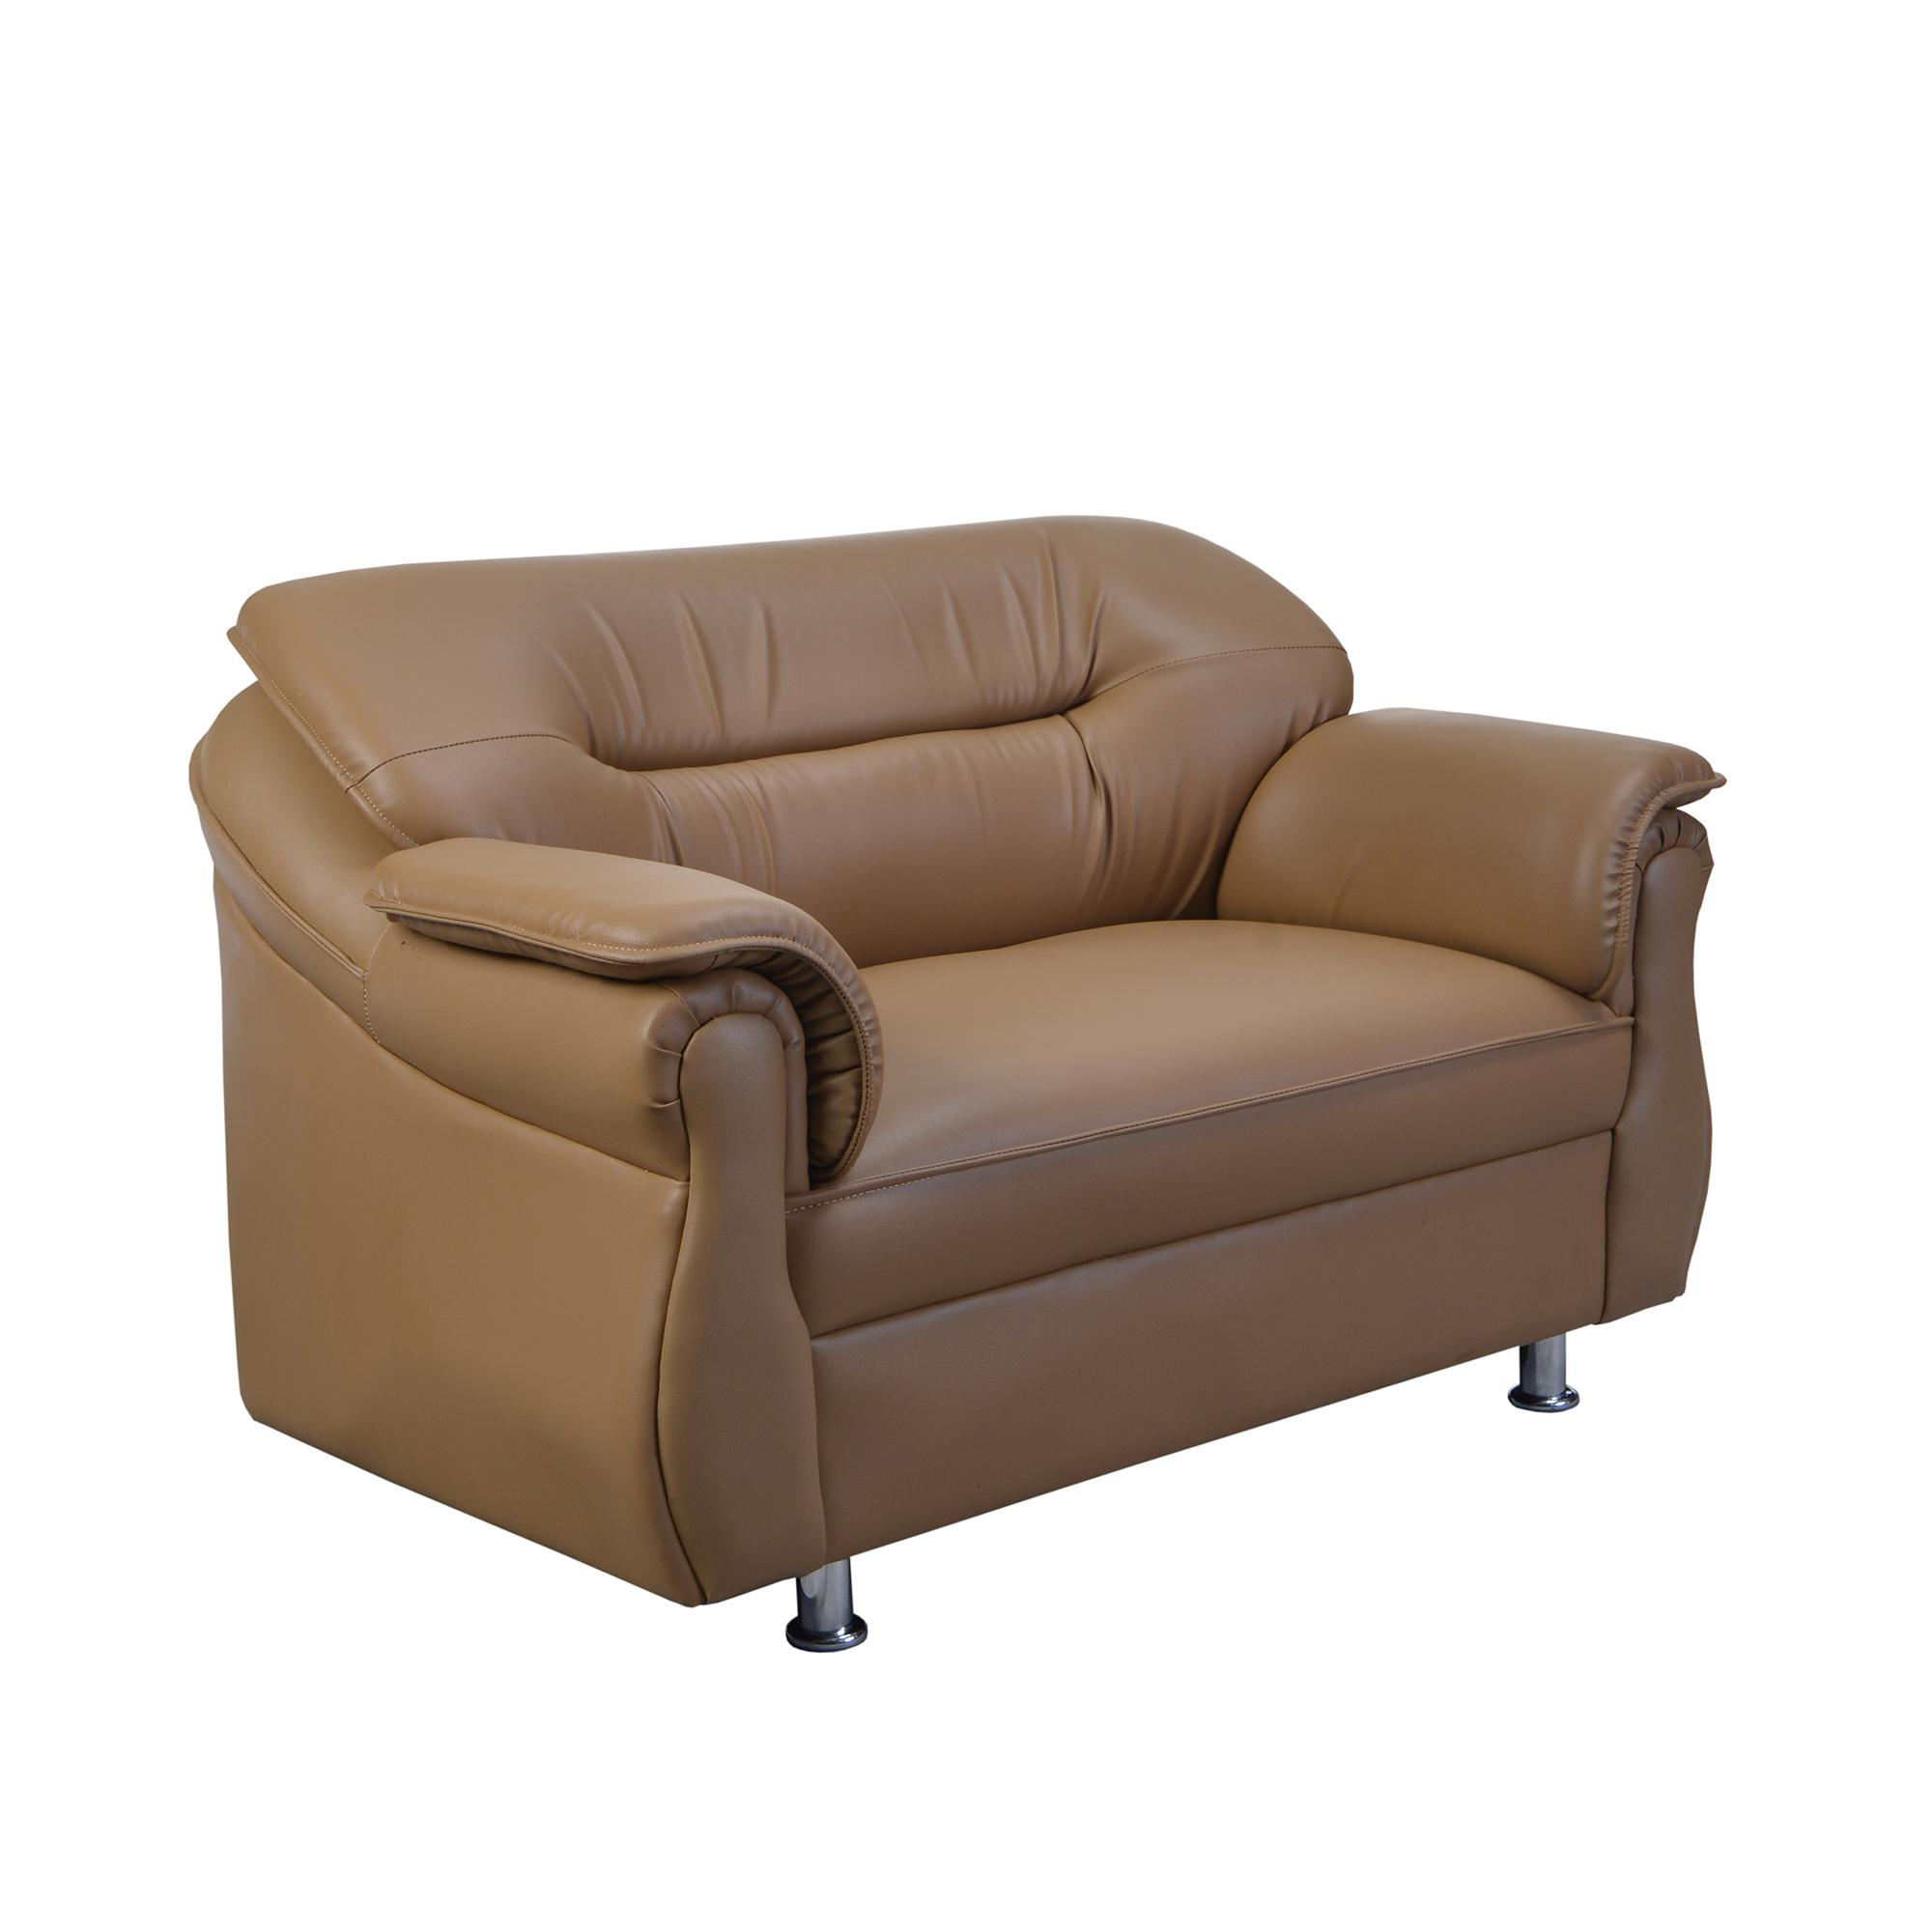 Olc Sofabed Nok14 Coklat Jabodetabek Only Daftar Harga Terbaru Jysk Felicia 186x92x92cm Light Grey Sofa 110388000 Detail Gambar Xena 2 Seater Khusus